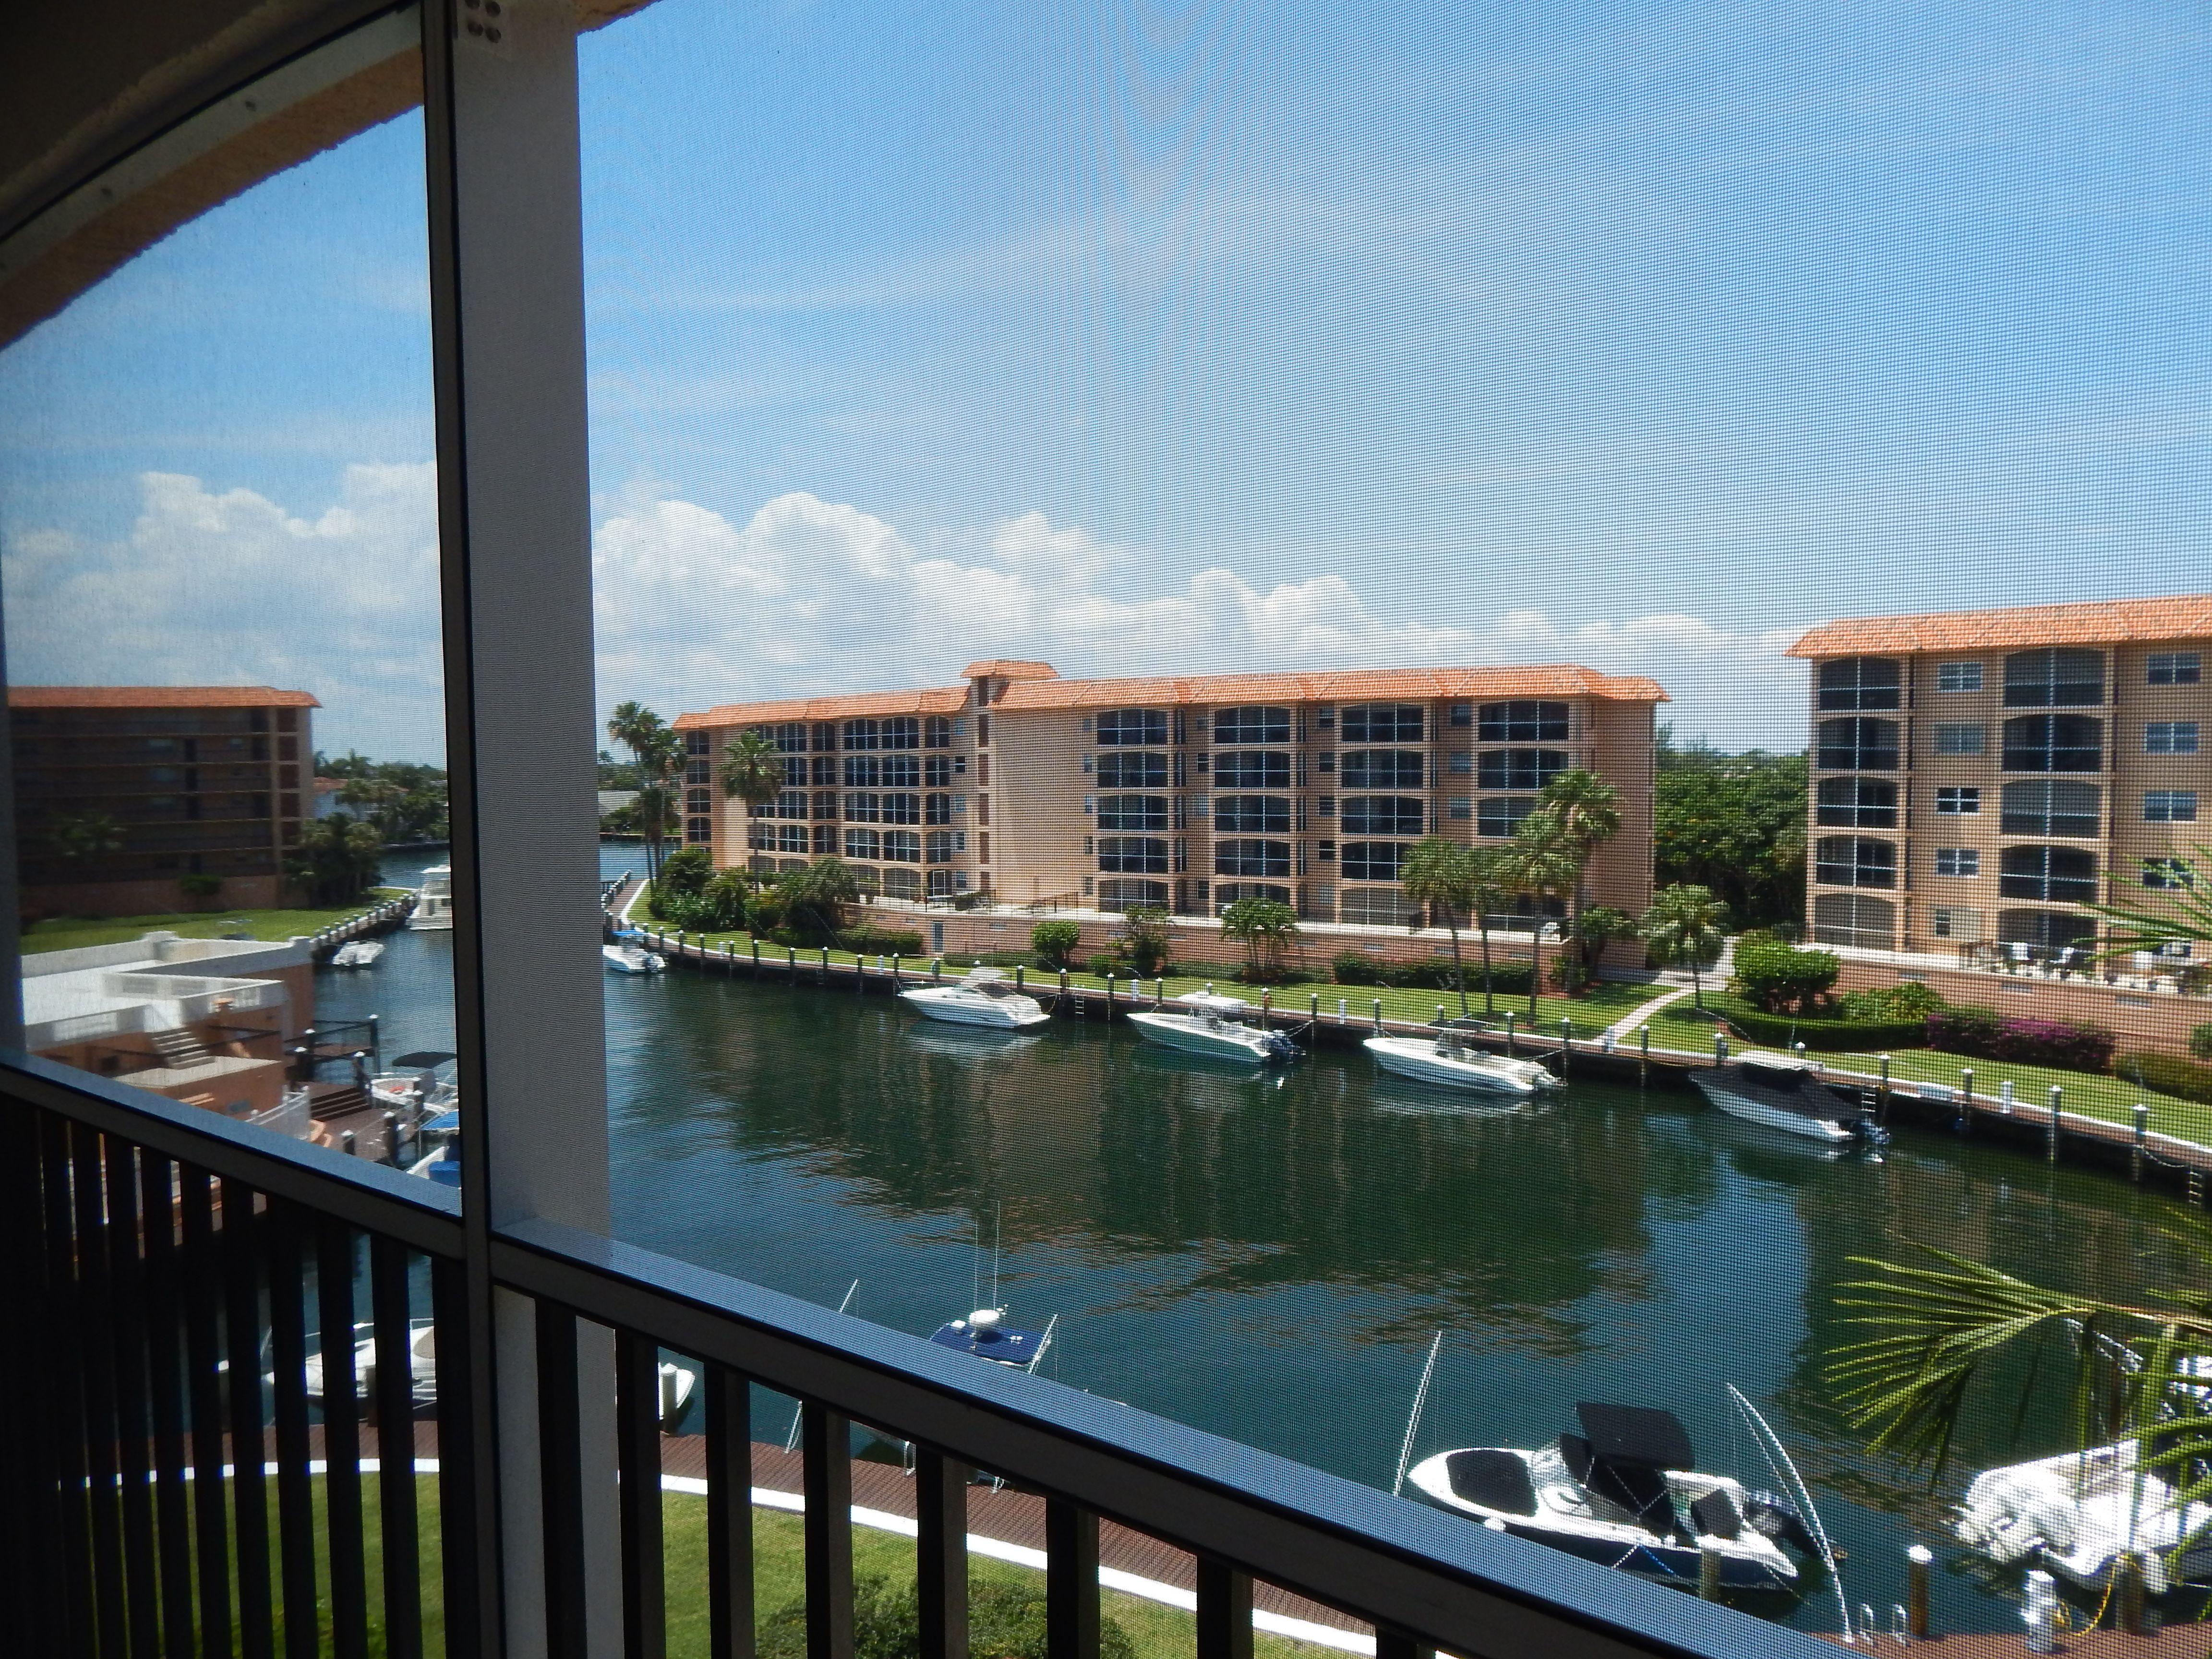 San Remo Boca Raton Florida Funished Rental 1 bed 1 2 bath